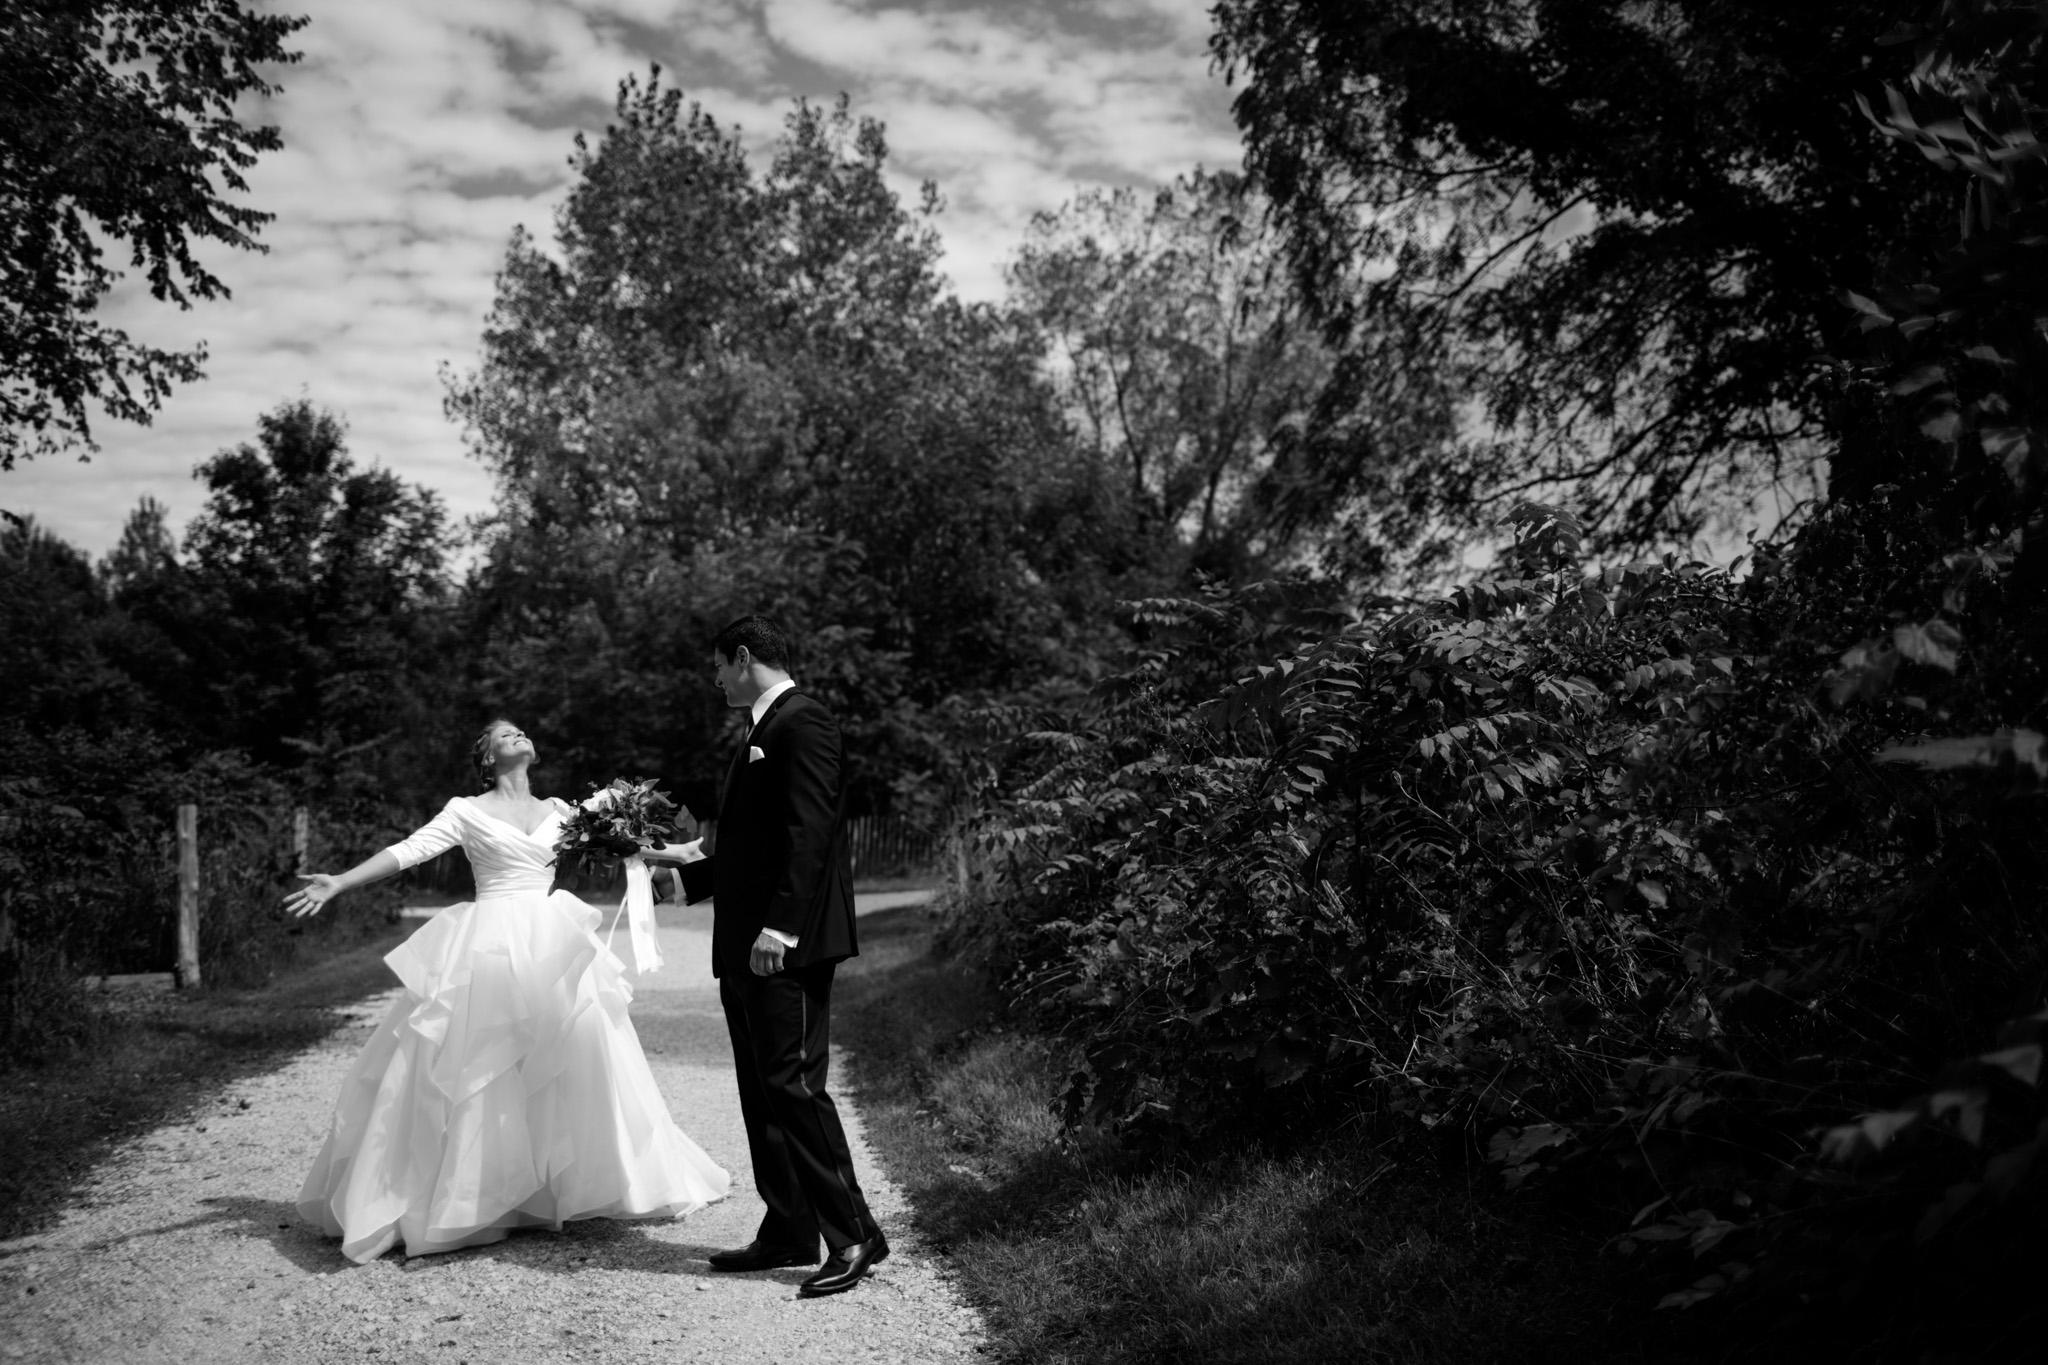 MillCreek-Wilde-Wedding-Barn-Michigan-Eliza-Eric-Vafa-Photo457.jpg